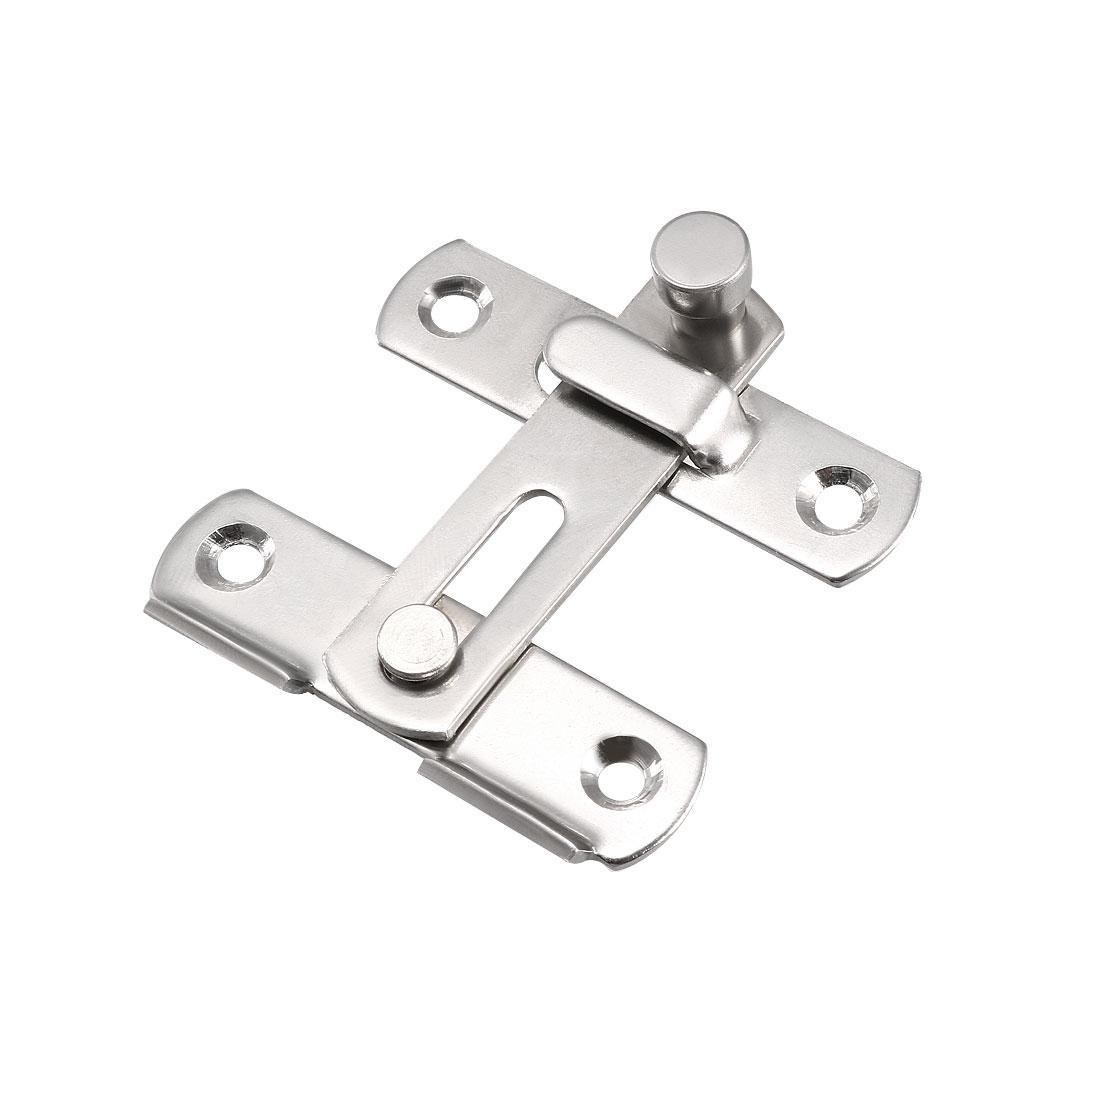 Flip Door Latch 201 Stainless Steel 51x48mm Gate Latch Hasp Slide Lock 3 Pcs